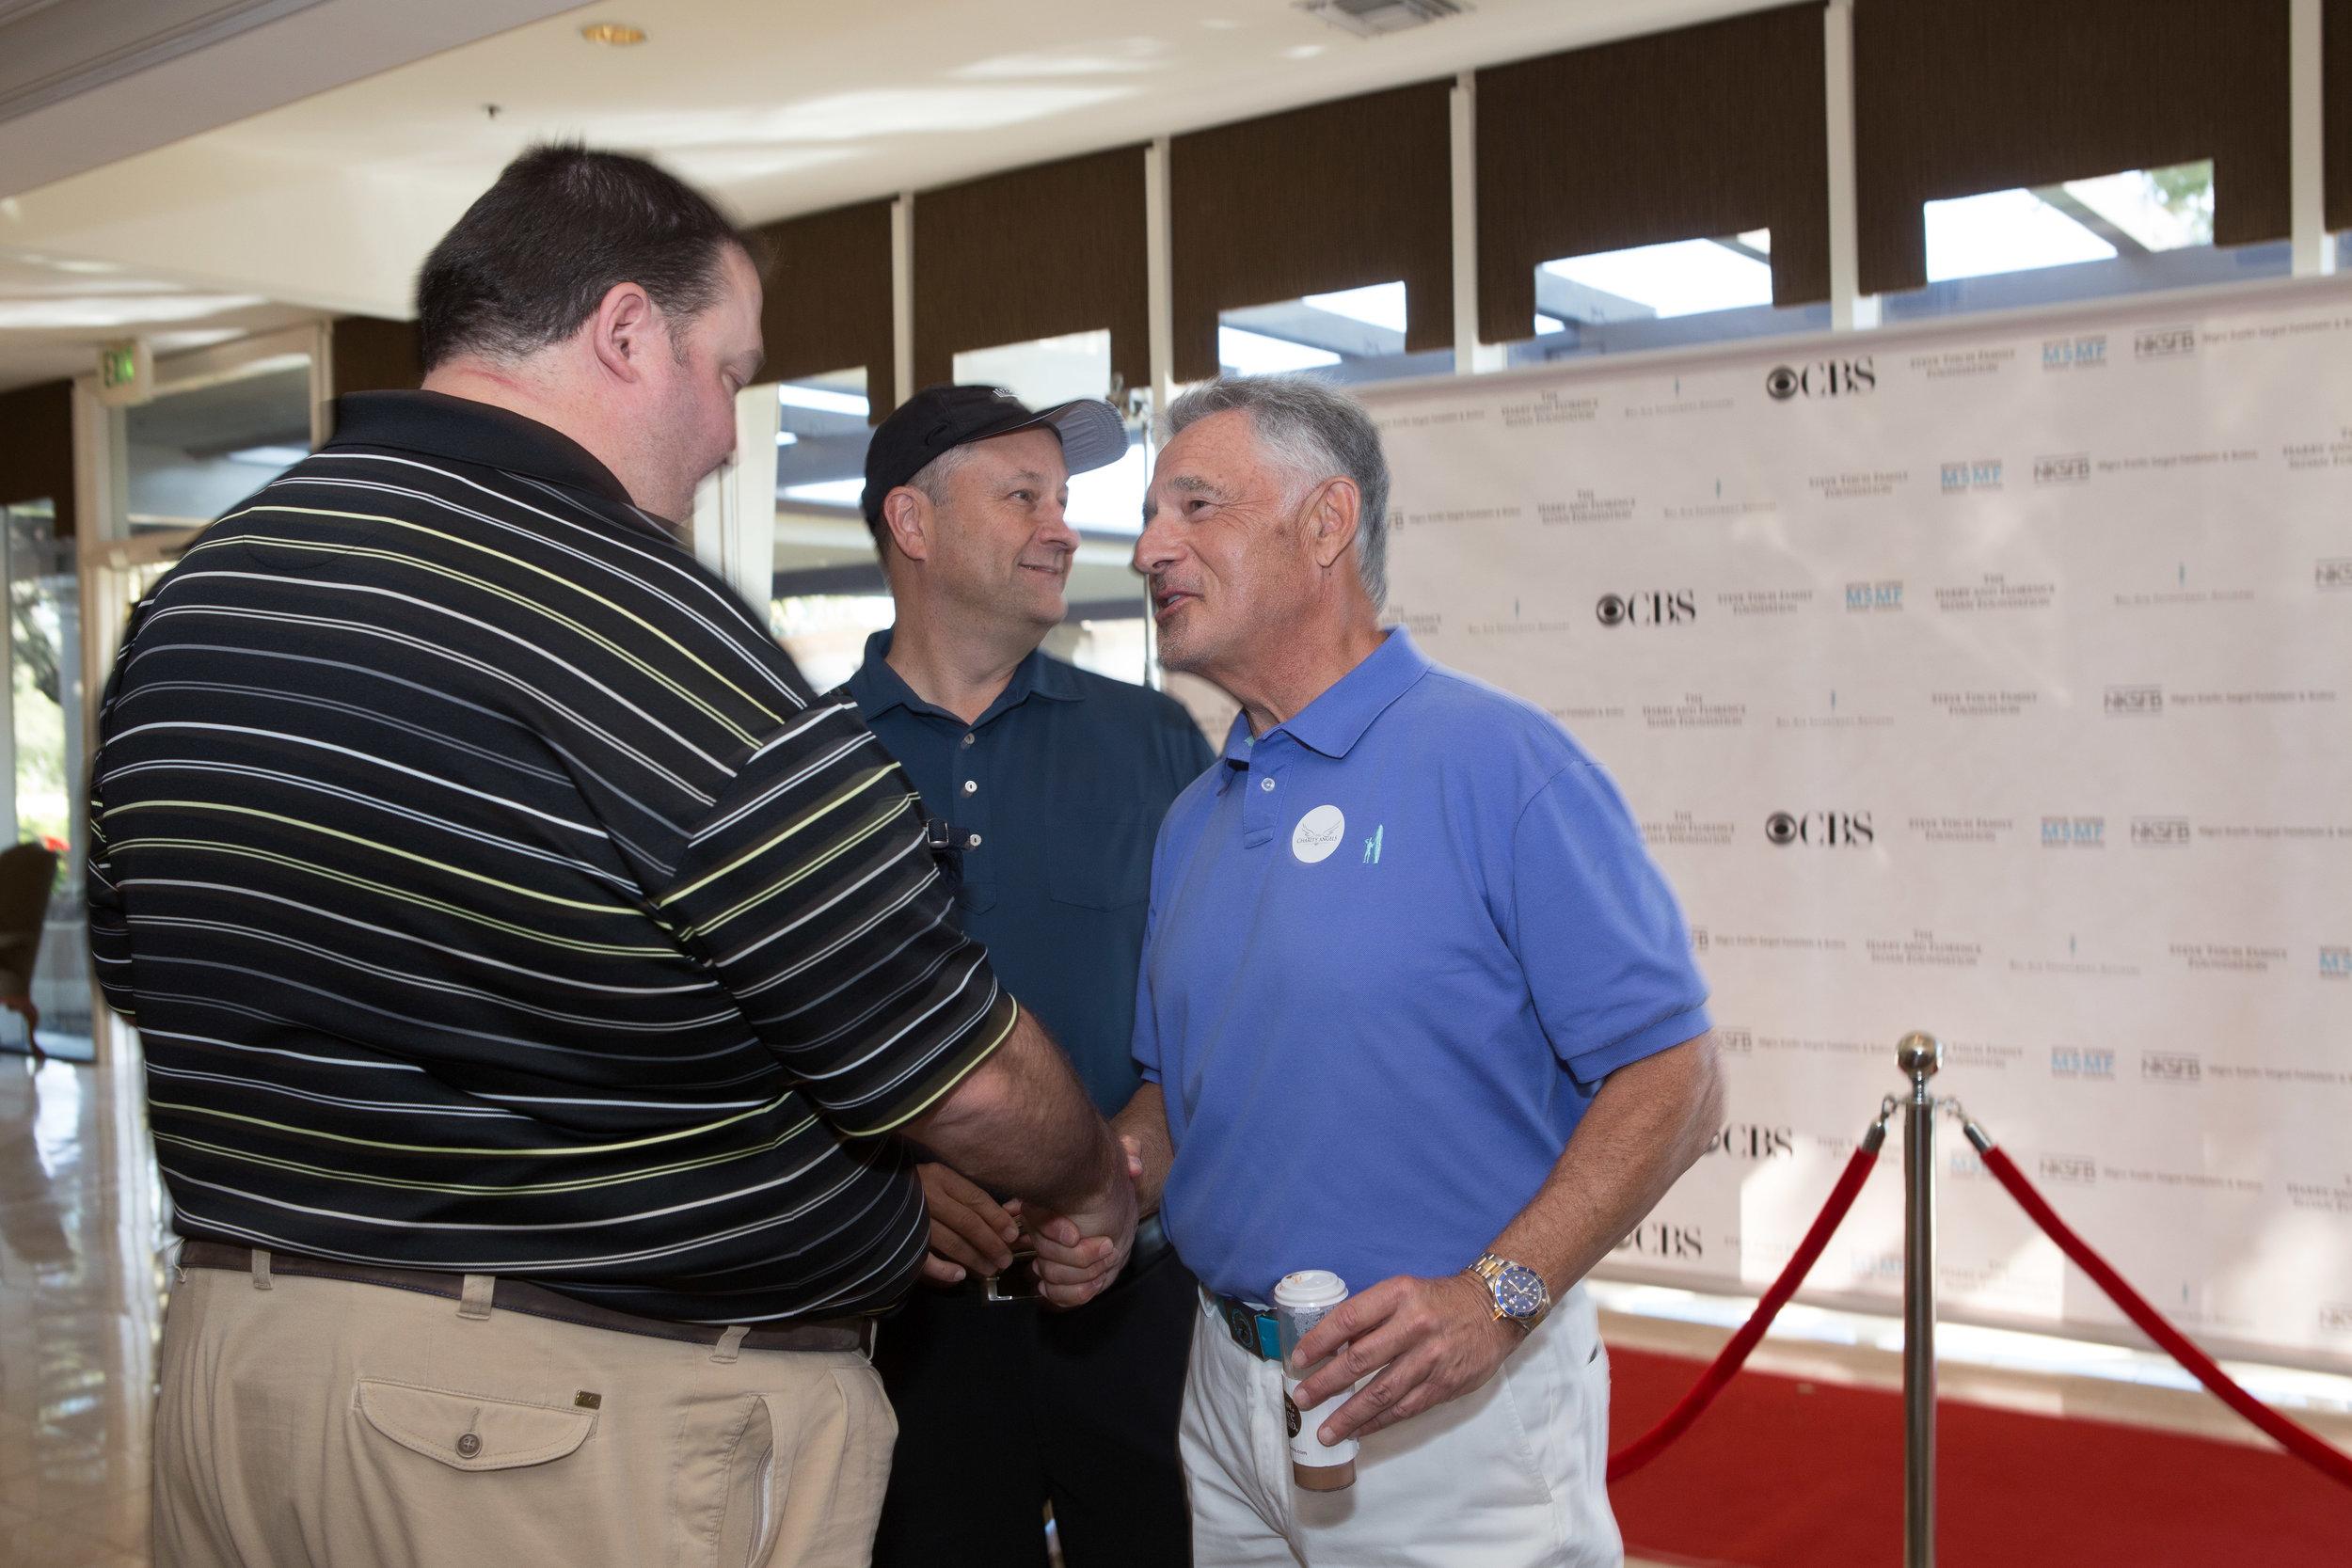 IMG_7697-Ron & Golfers.jpg